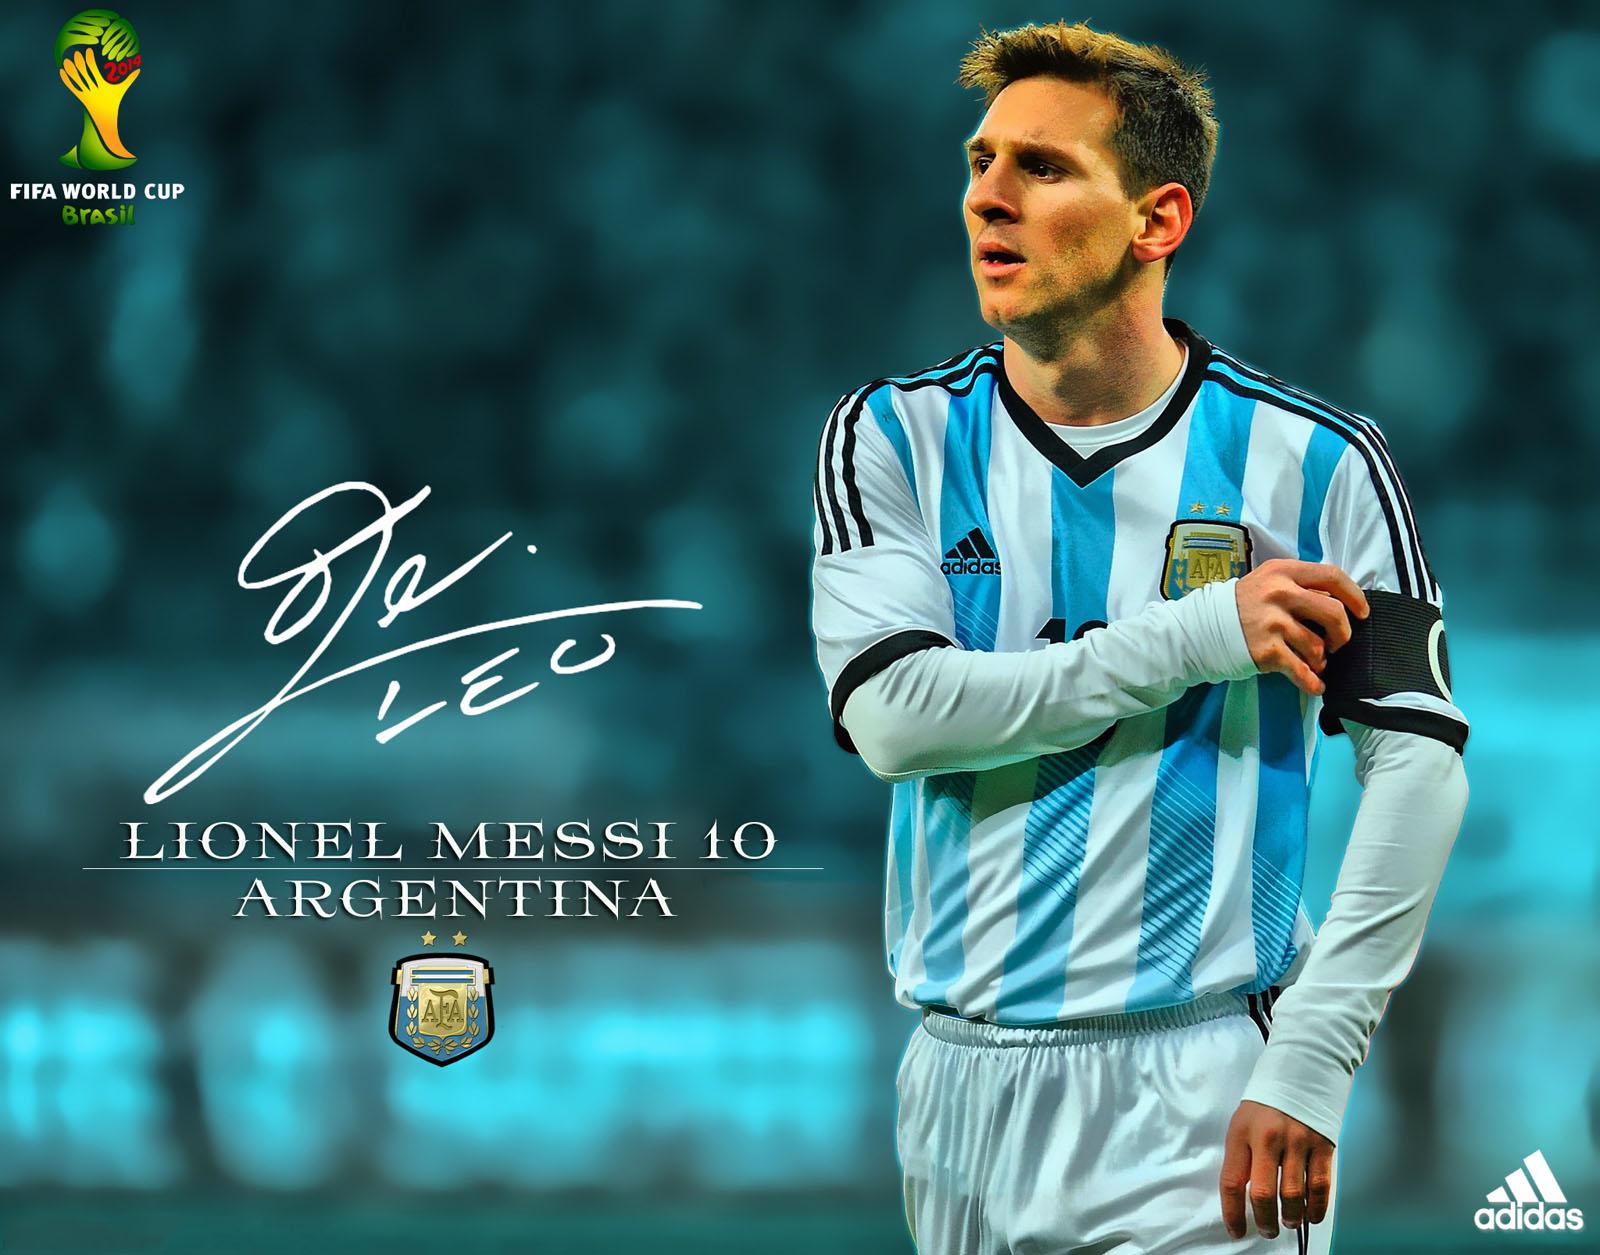 Messi Wallpaper 2014 3d Messi Argentina Wallpapers Background Hd Pixelstalk Net